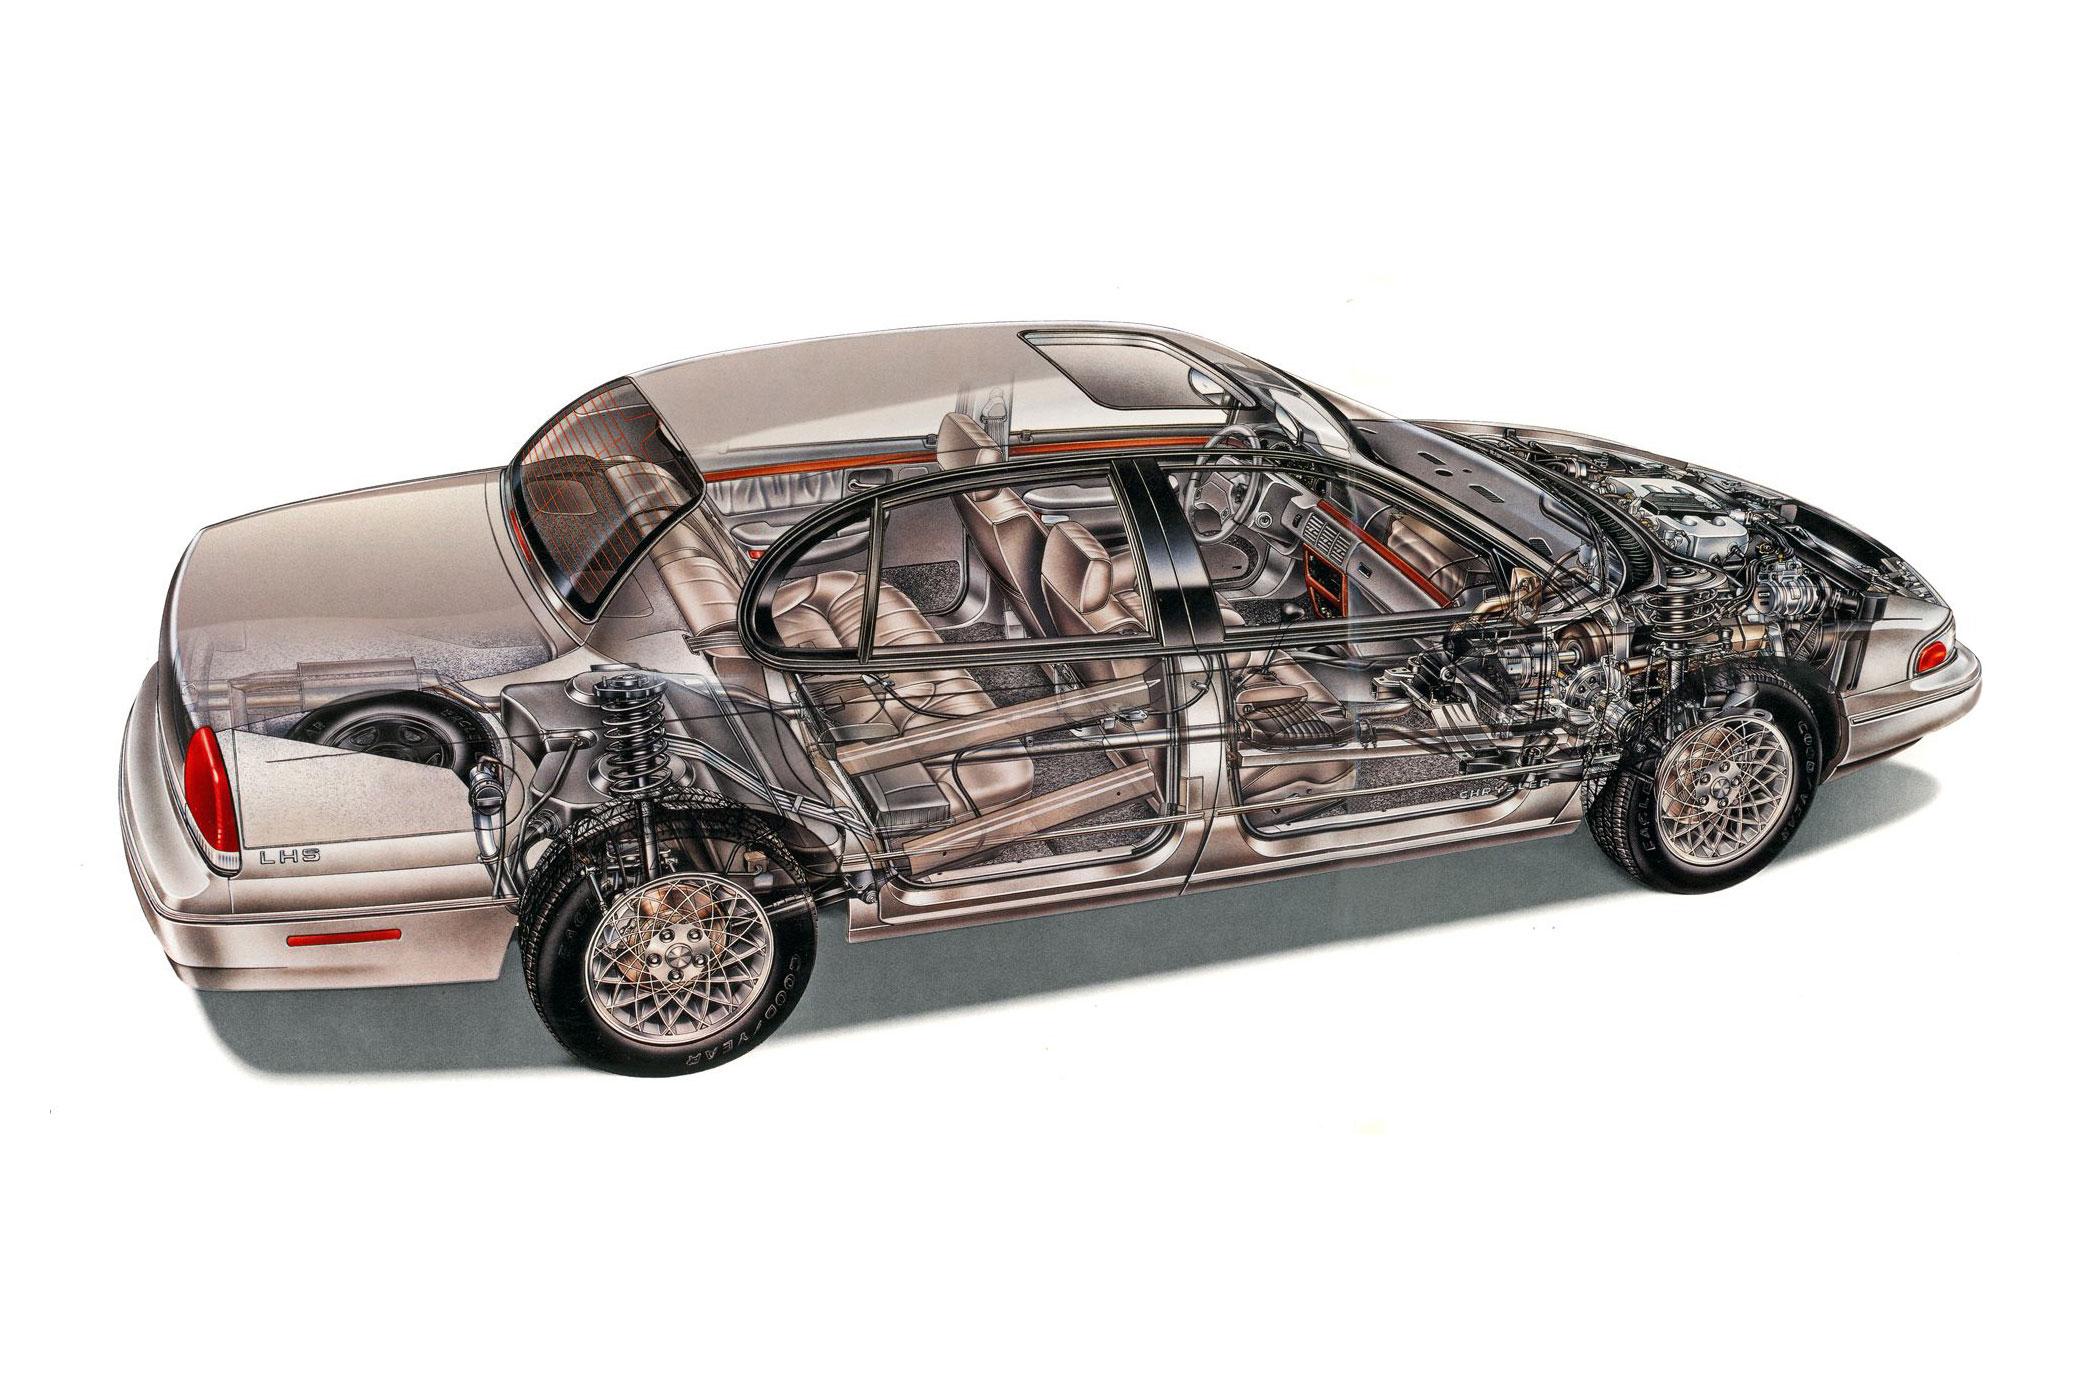 Chrysler LHS cutaway drawing